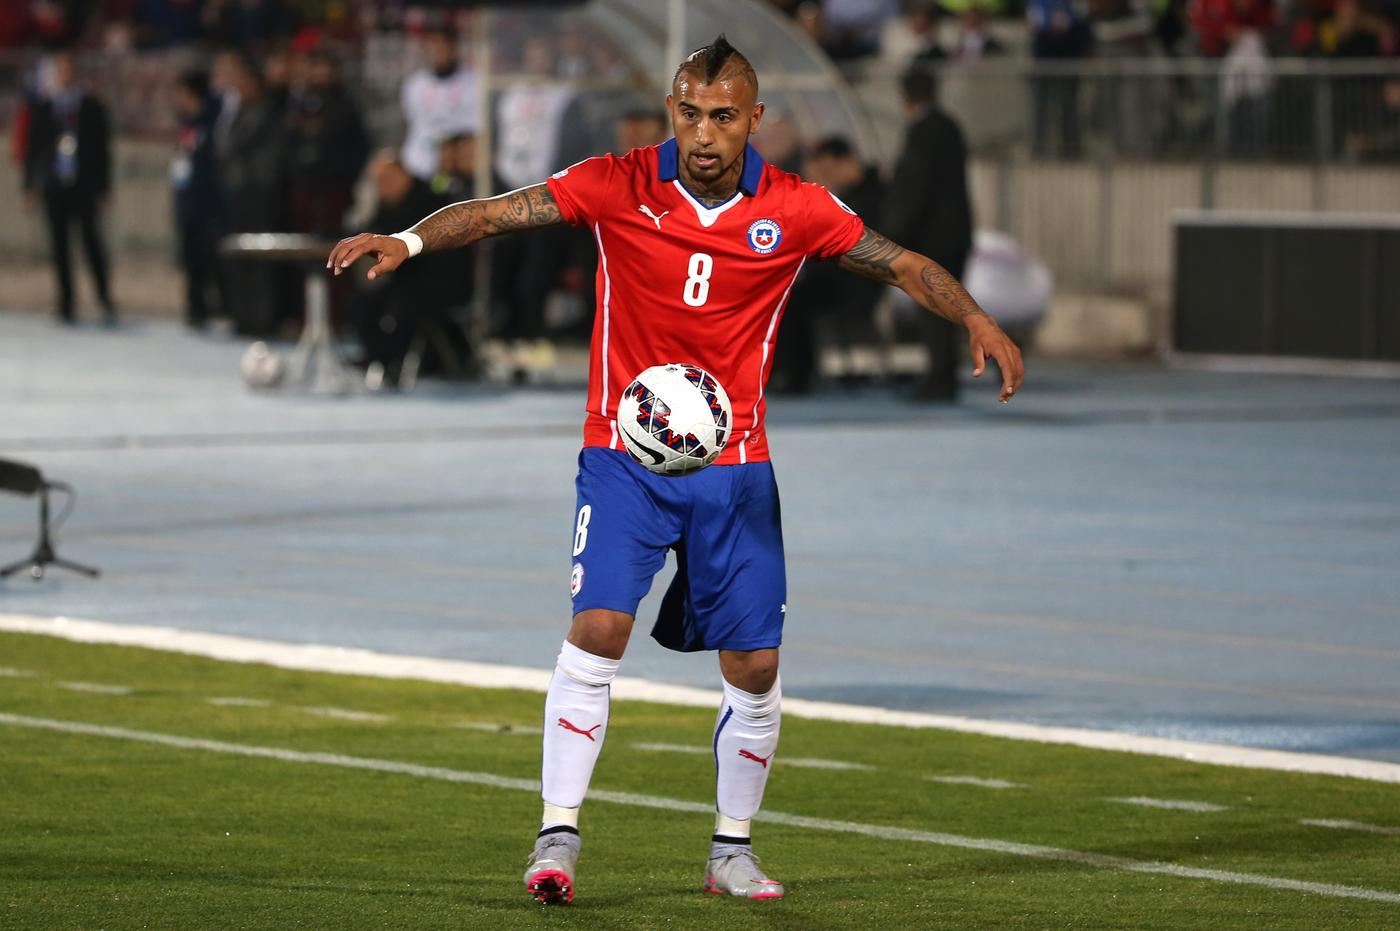 Arturo Vidal 'has completed Arsenal transfer', says journalist Hernan Feler